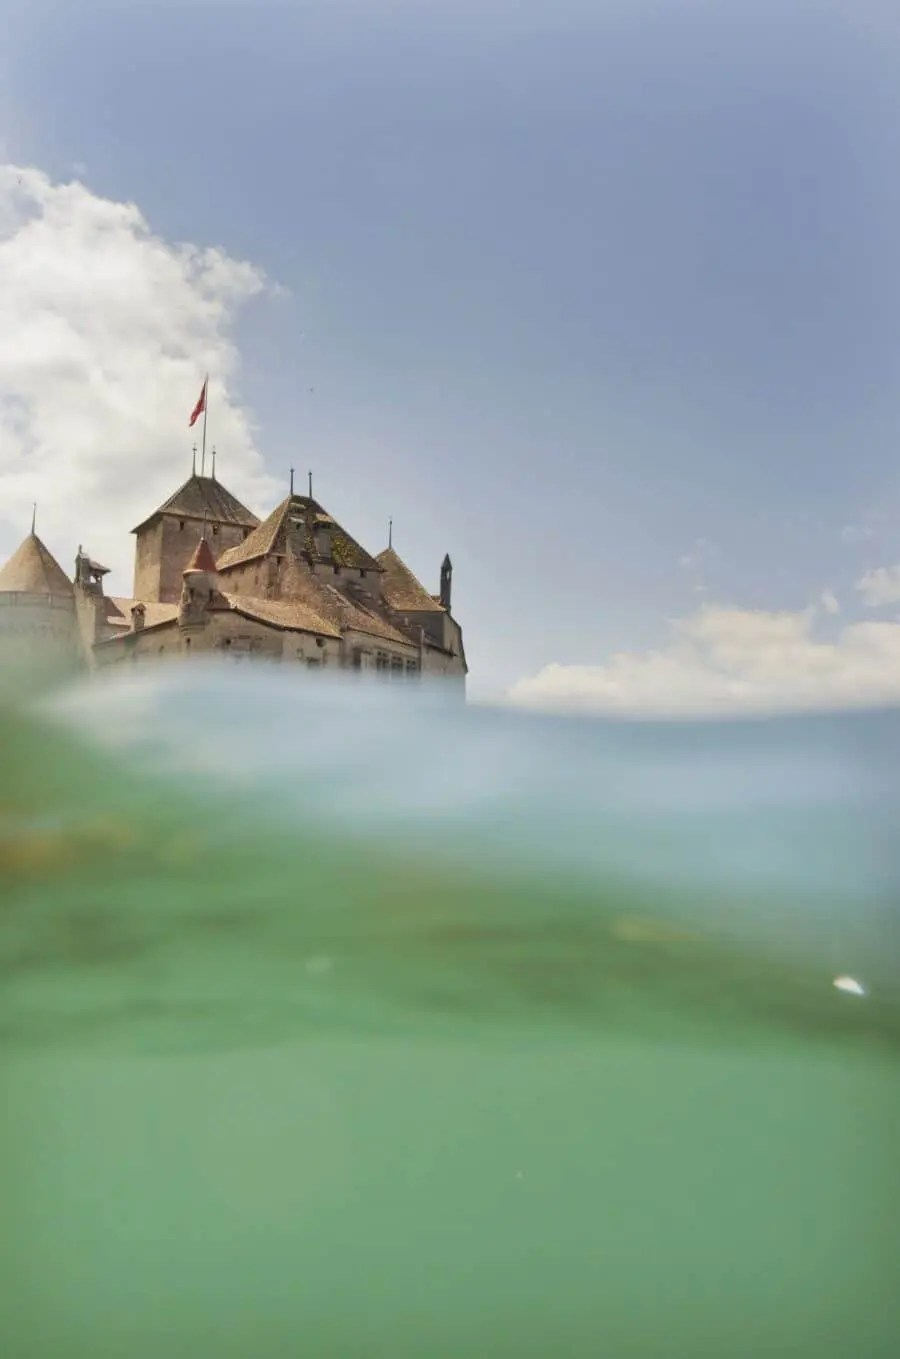 Chateau de Chillon, Switzerland tourism by The Wandering Lens